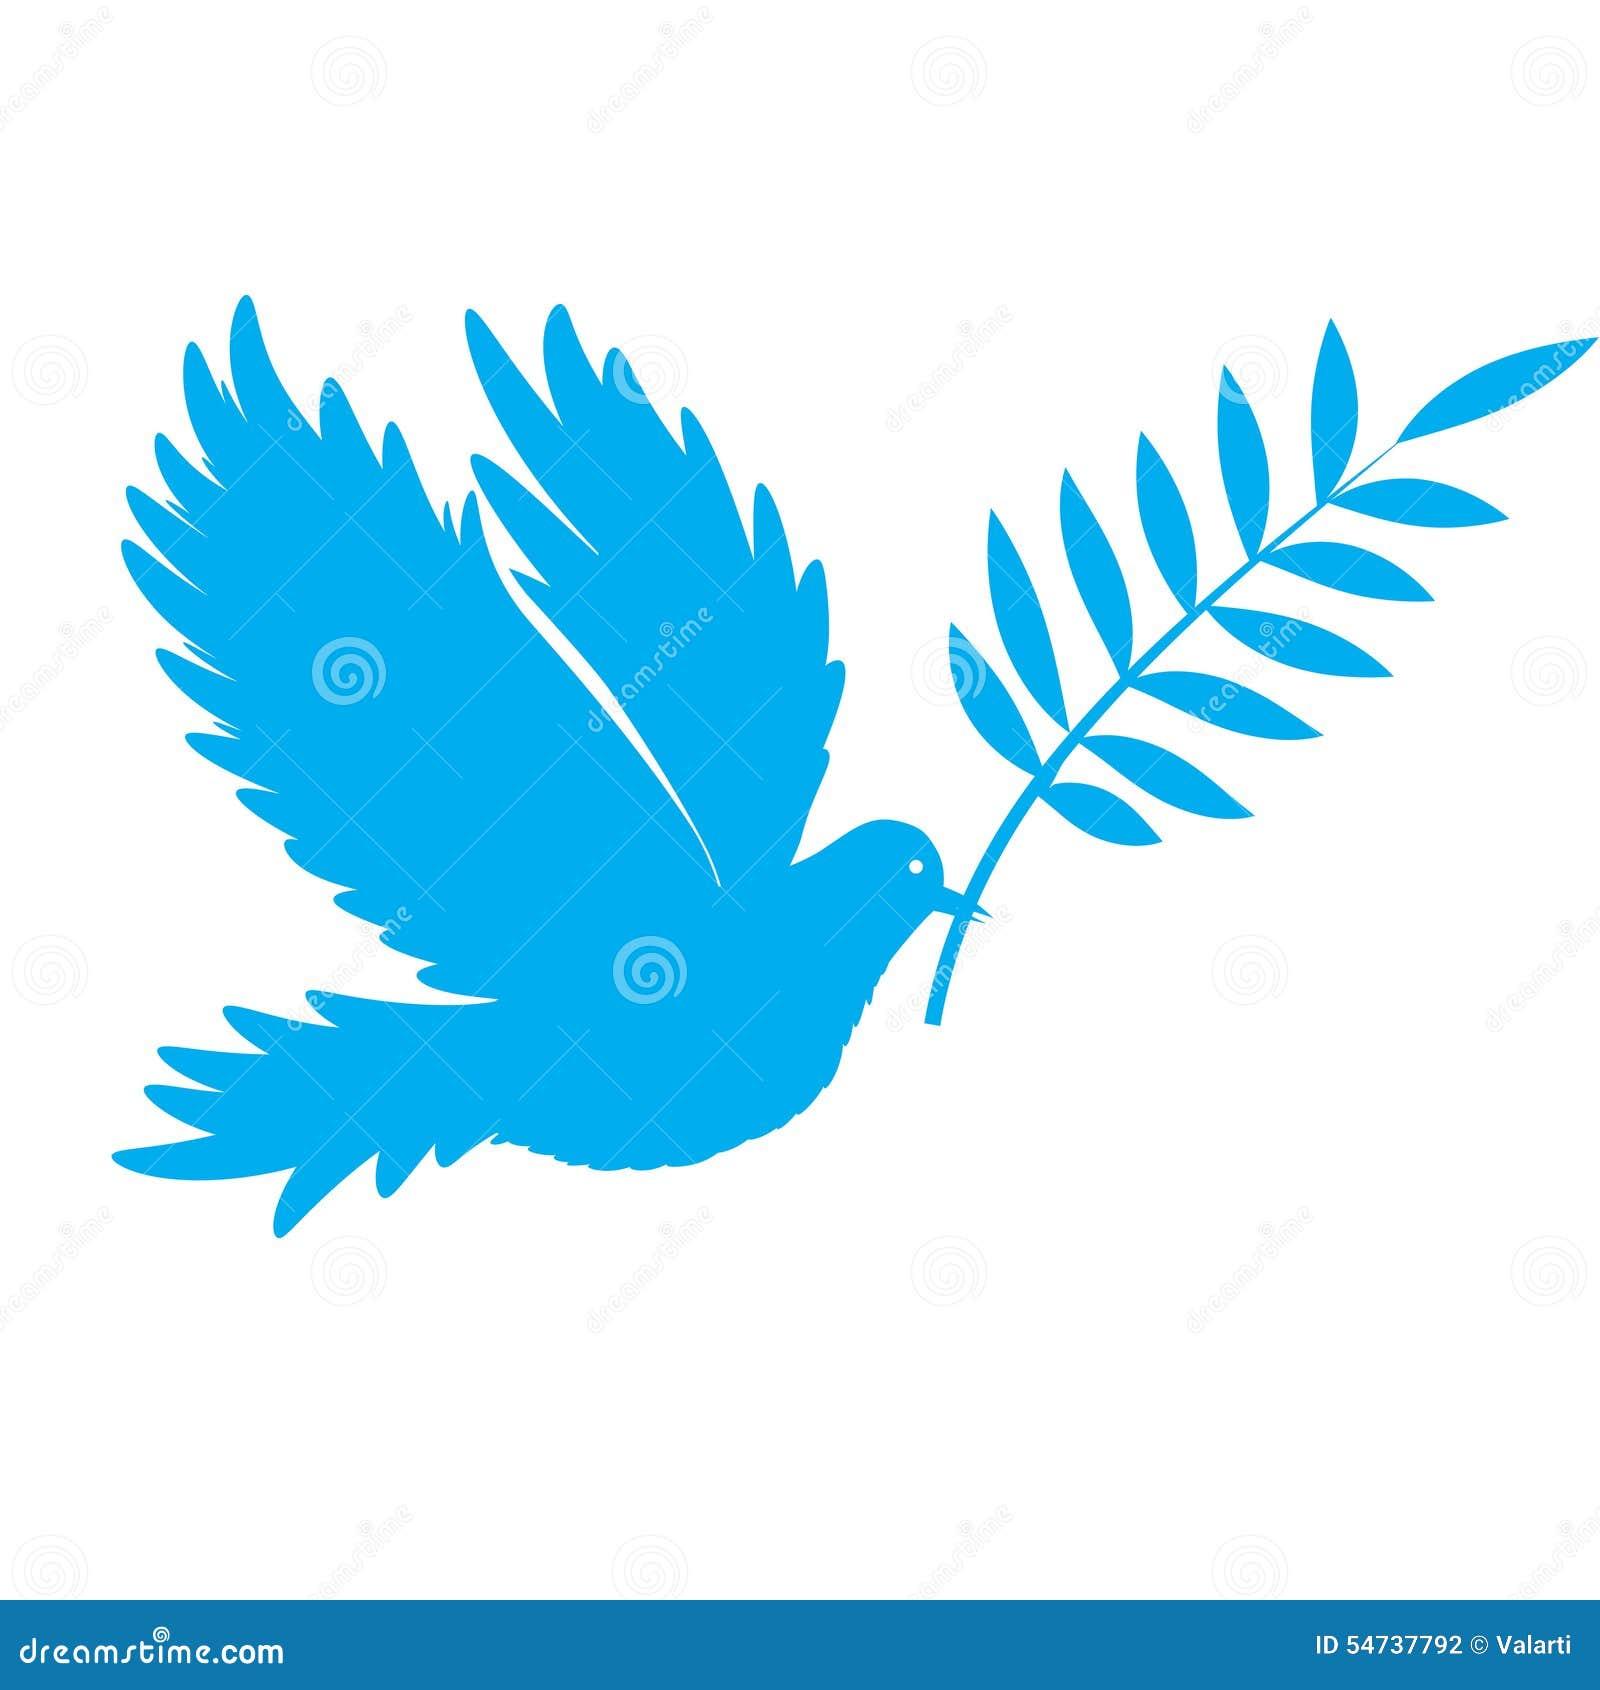 Dove bird peace sign - photo#20